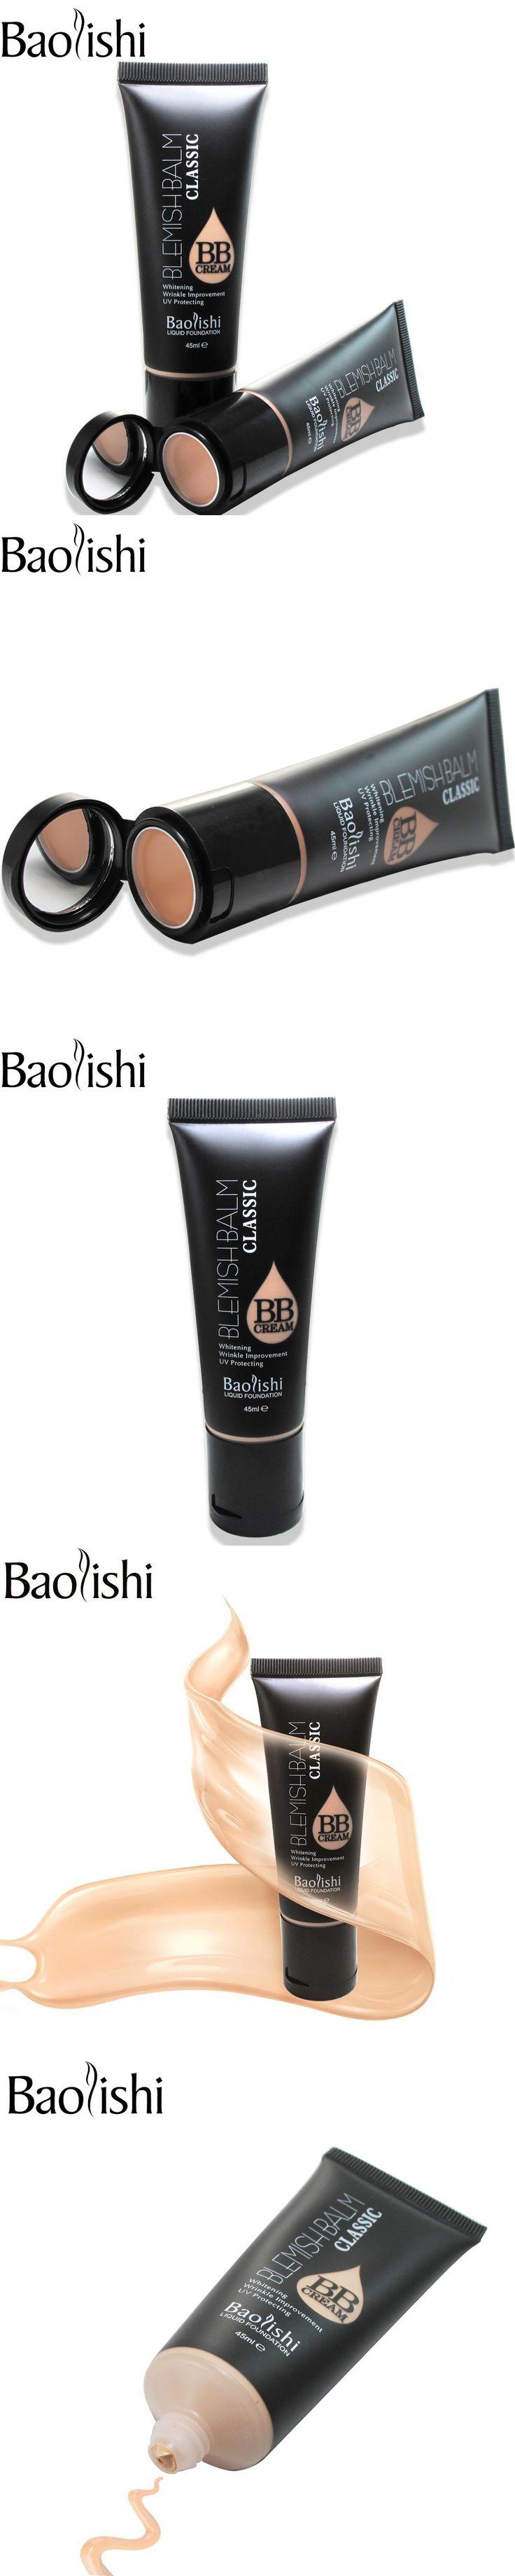 baolishi 5 color Face Foundation Makeup whitening BB Cream Concealer nude makeup Foundation SPF 25 PA ++ UV protection sun cream